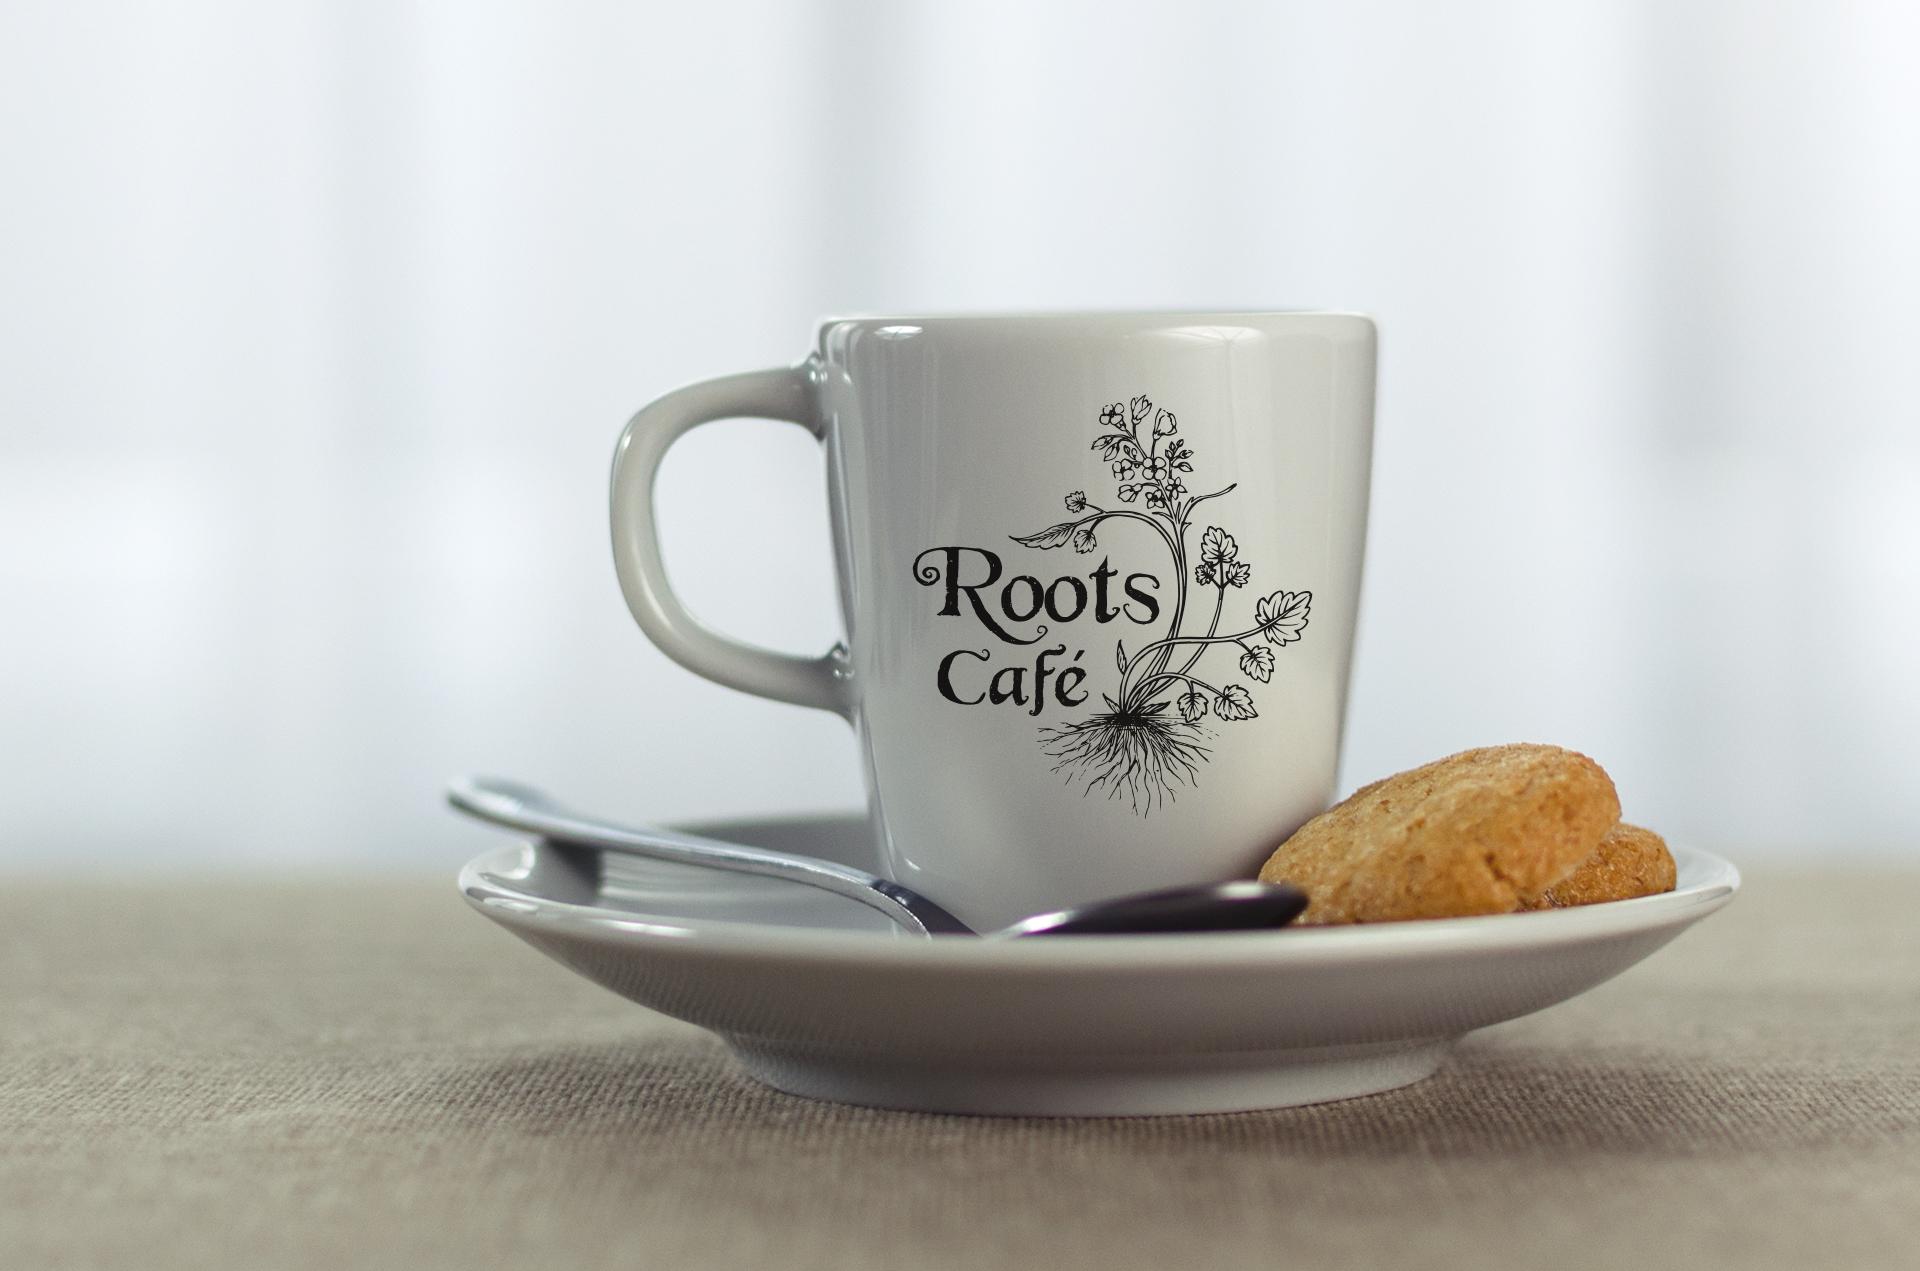 Roots Café Tazzina - Eleonora Casetta